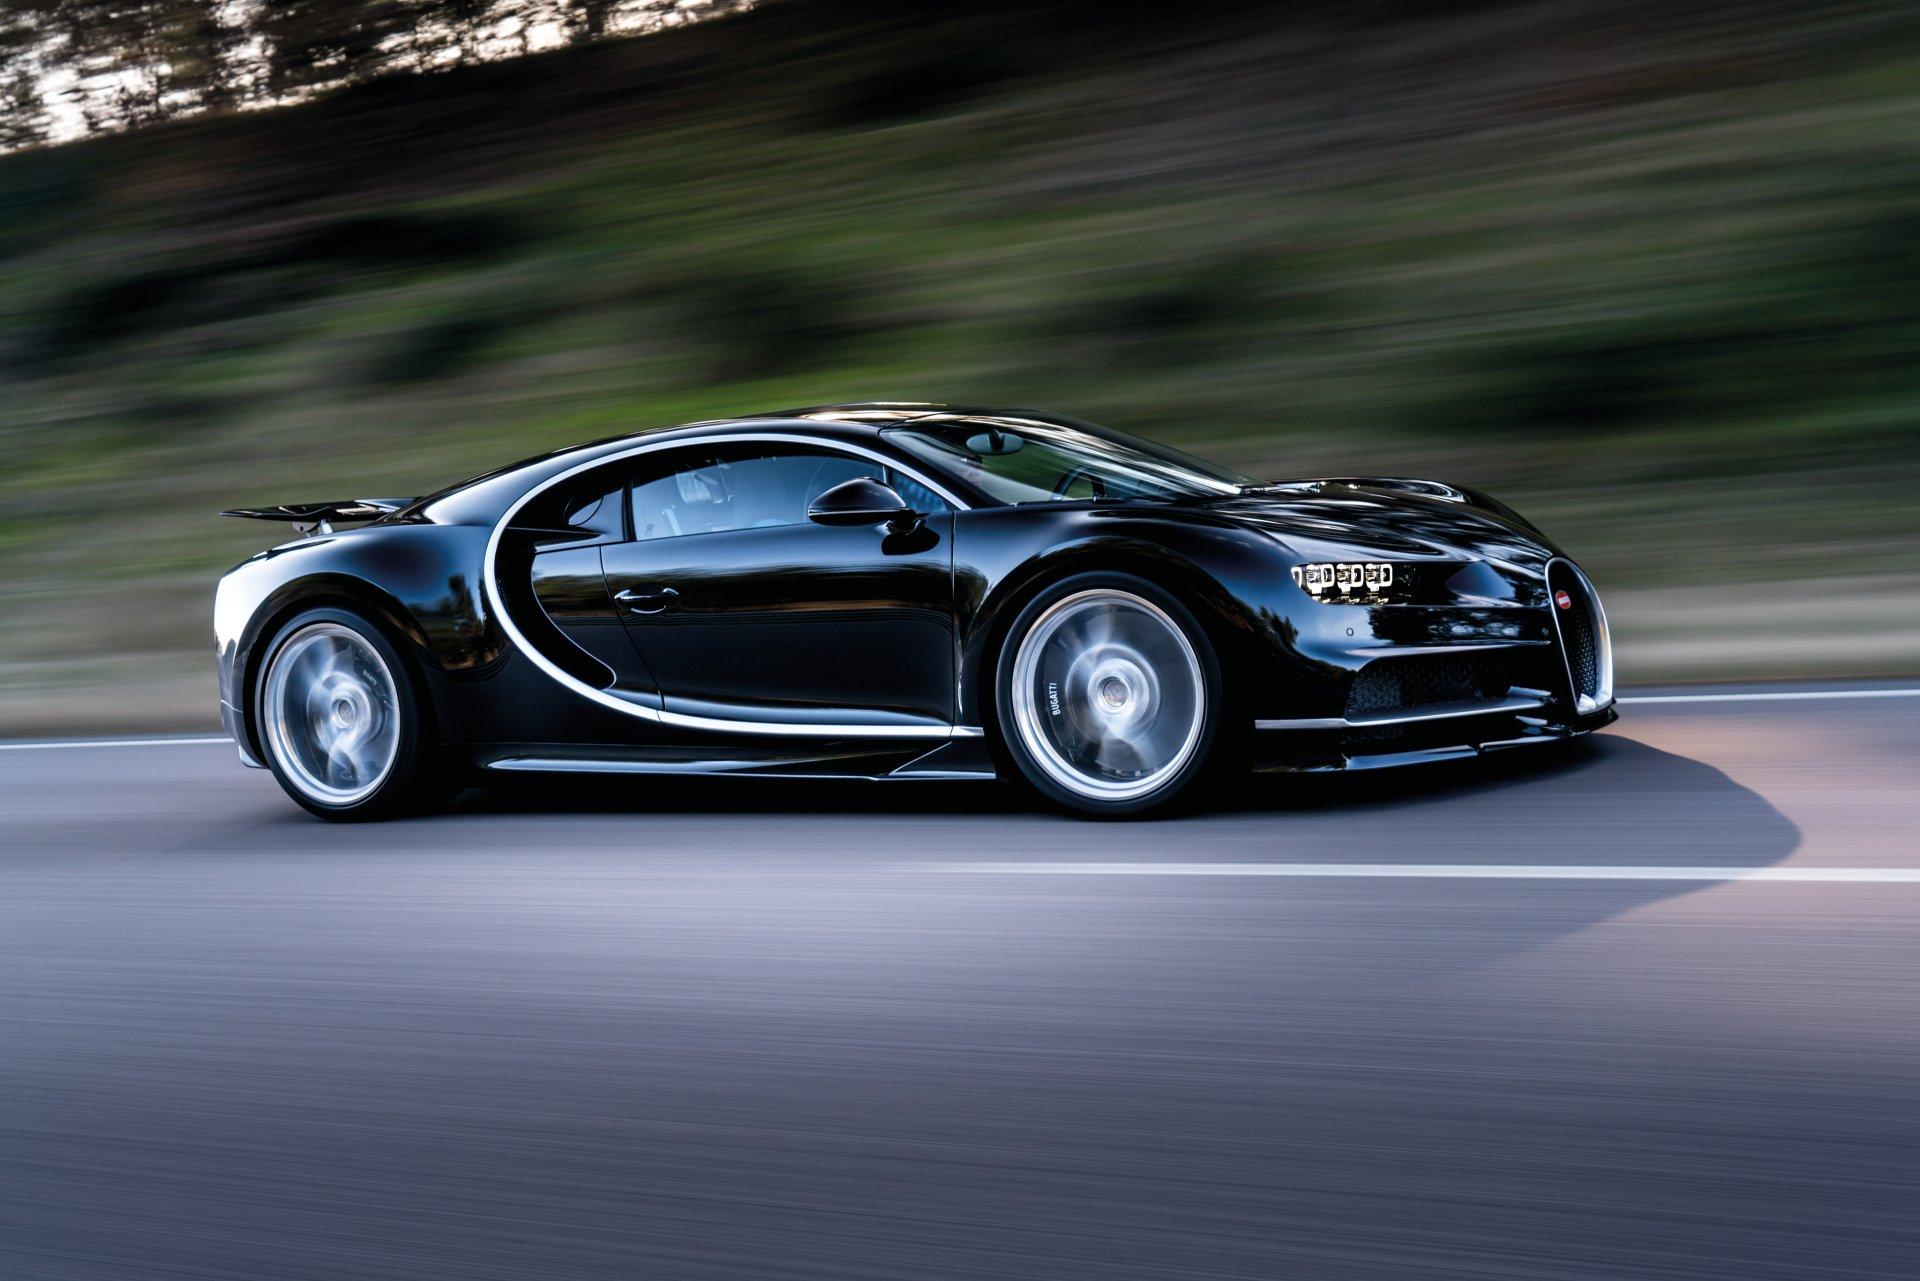 Vehicles - Bugatti Chiron  Bugatti Black Car Car Vehicle Sport Car Supercar Wallpaper